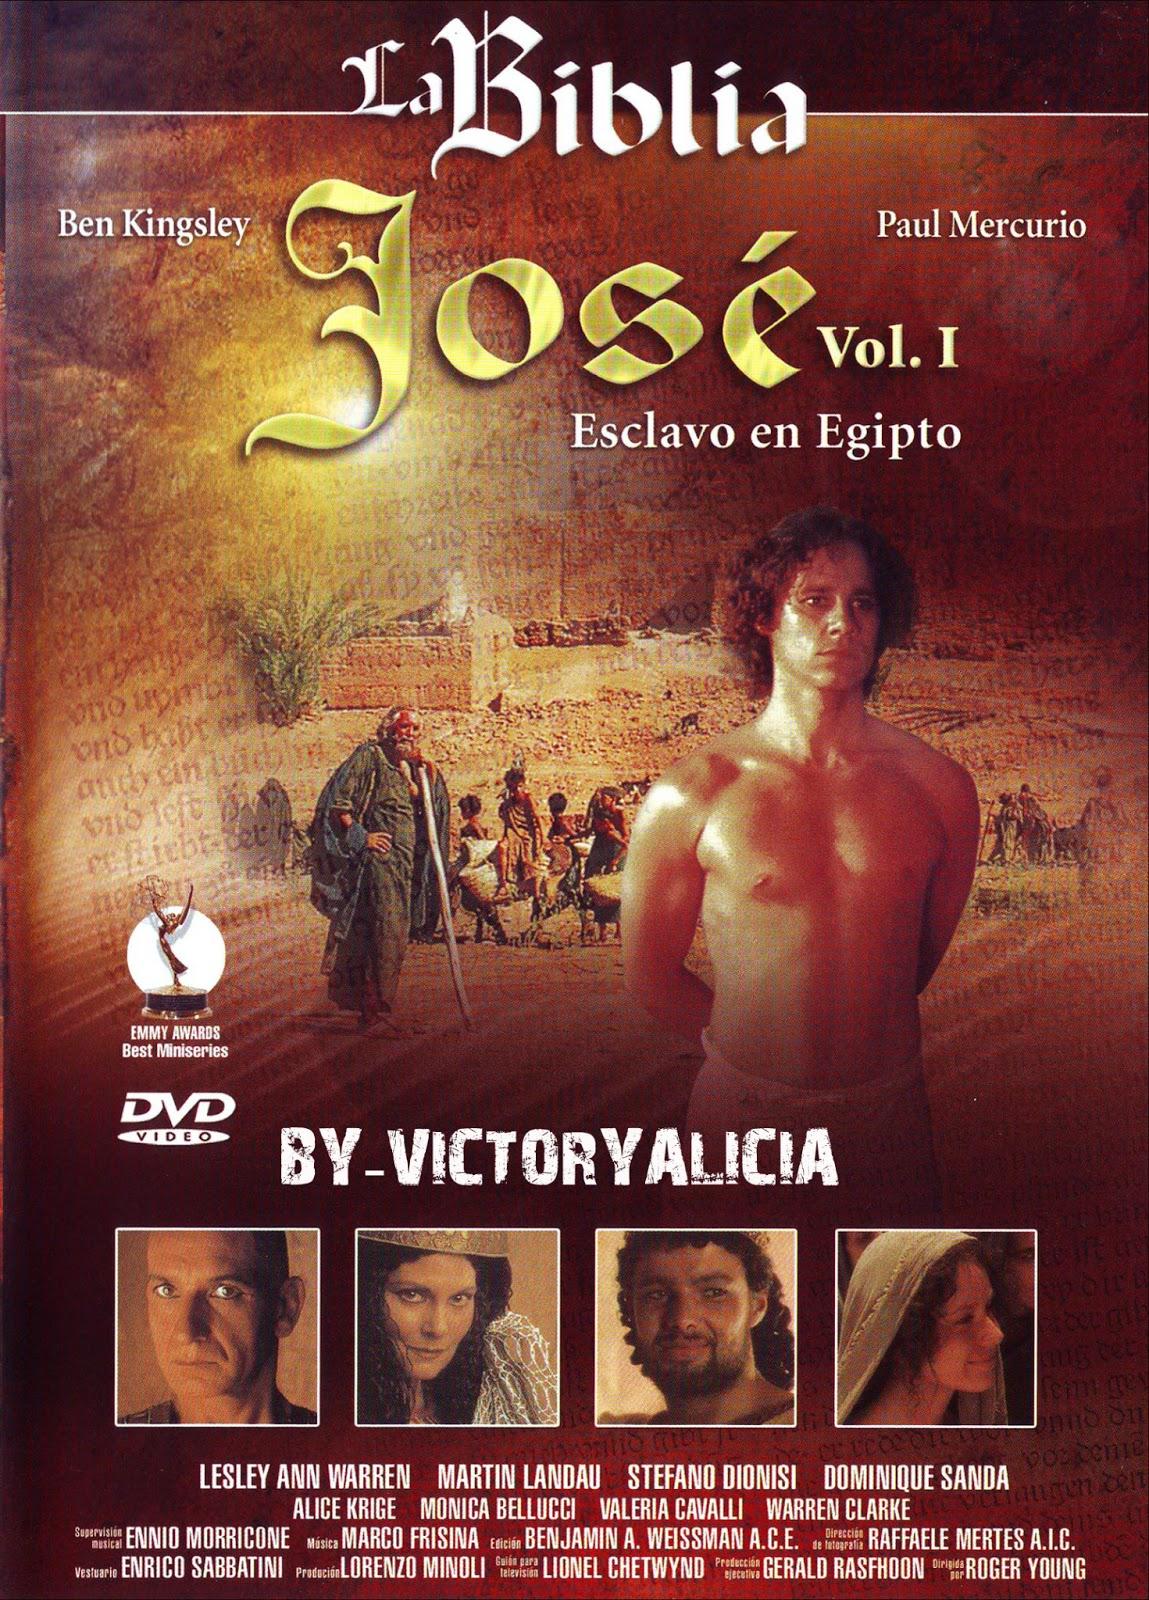 http://1.bp.blogspot.com/-BtnNcpjuzL4/UVY5lWntFtI/AAAAAAAAGDo/I_7knQNruXM/s1600/La_Biblia_-_2007_-_Volumen_04_por_Jenova_DVD.jpg